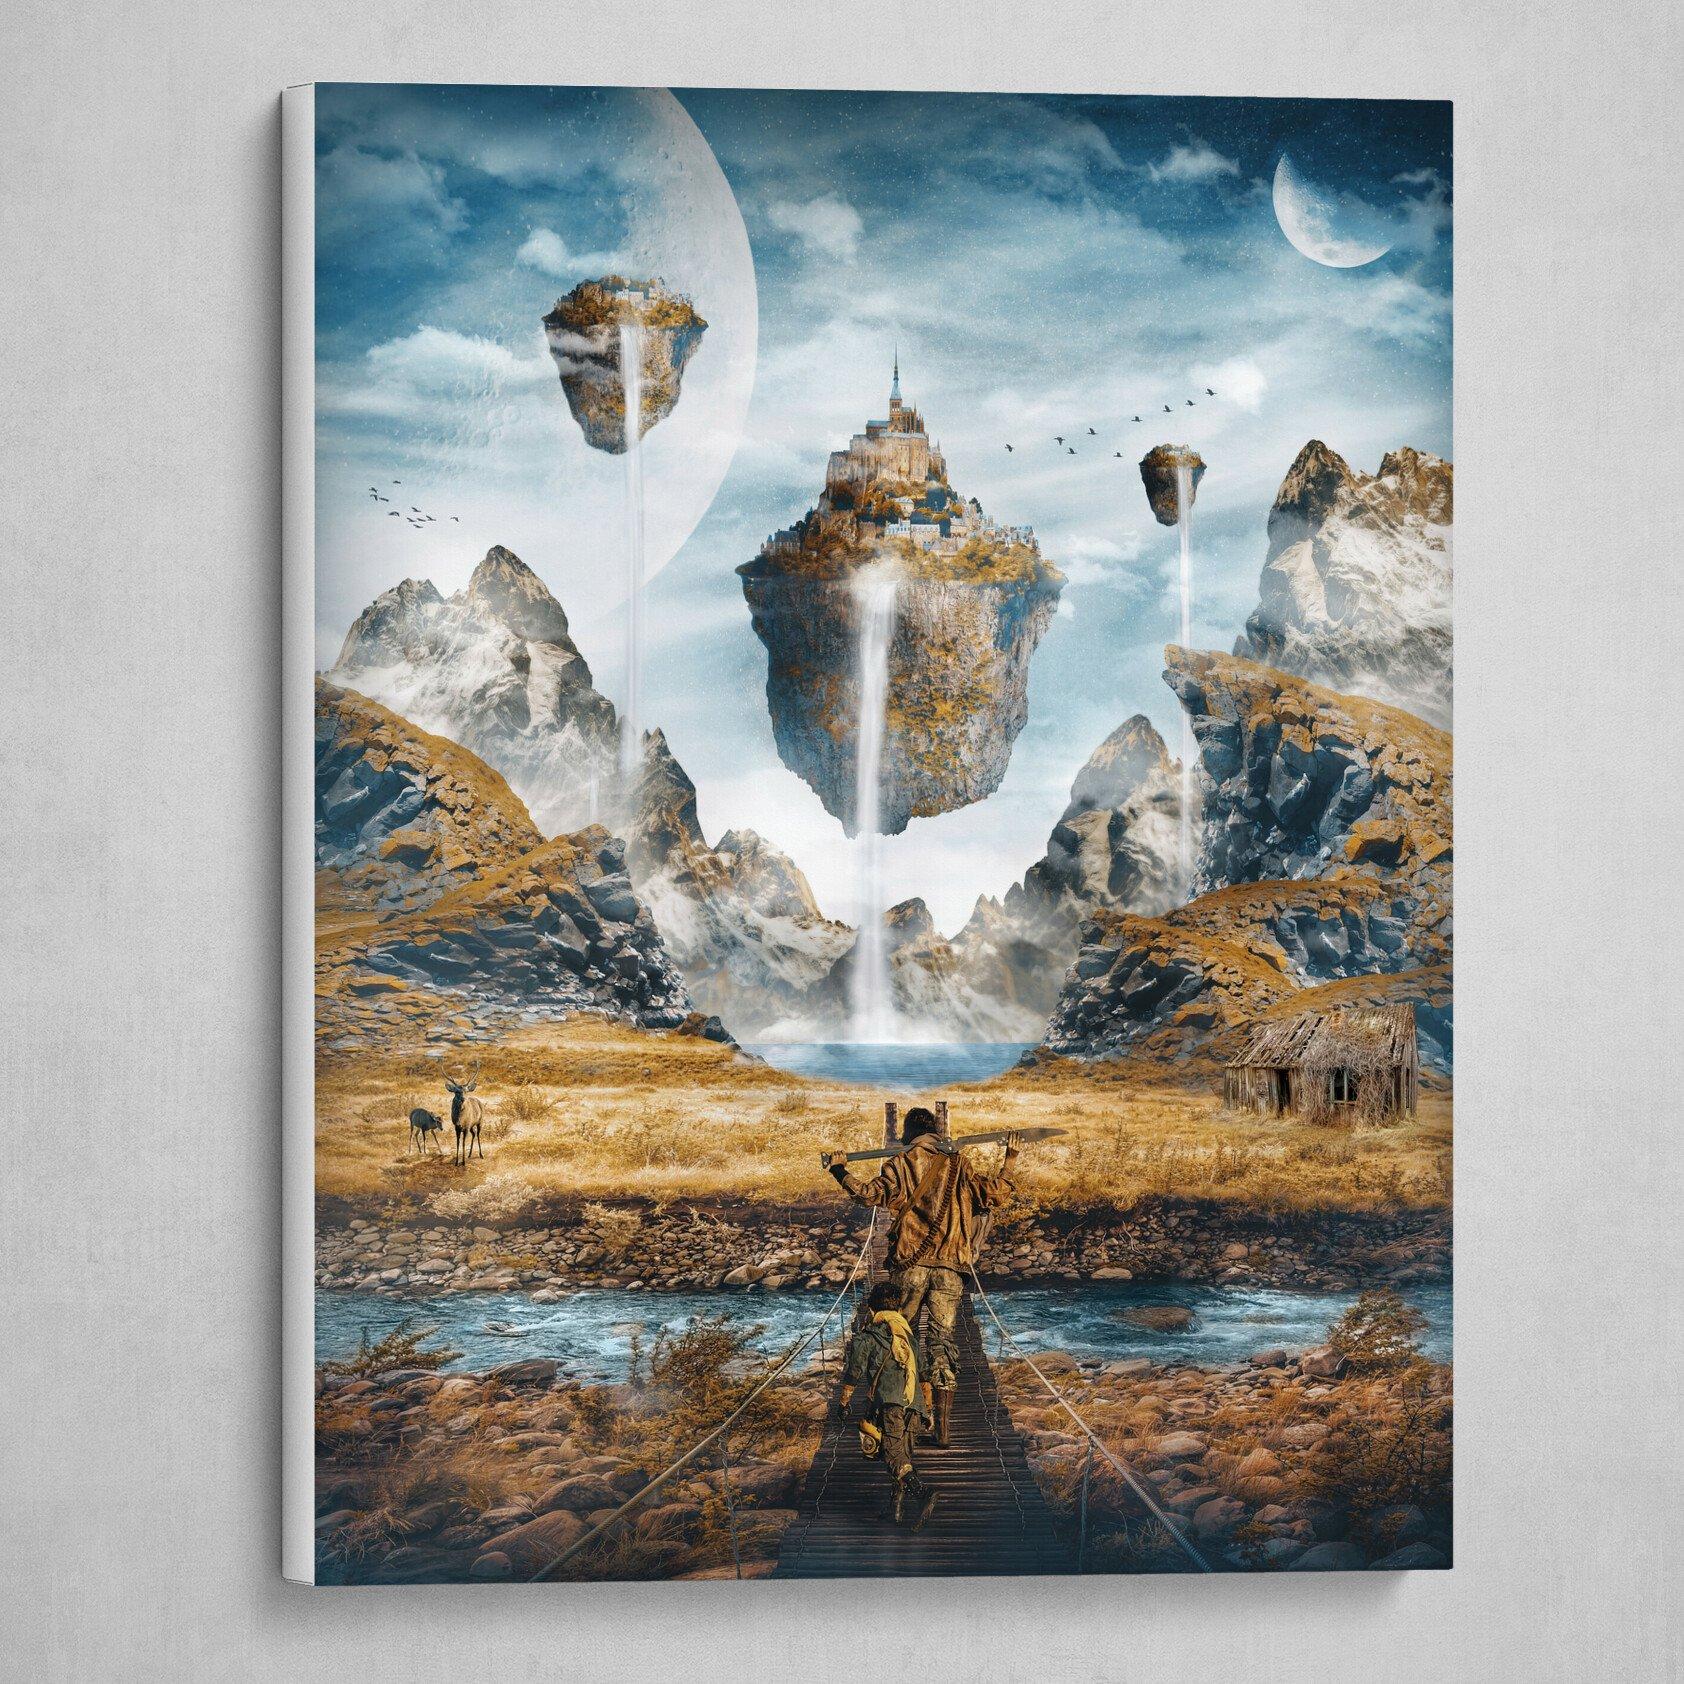 Sci-Fi Fantasy Landscape Painting